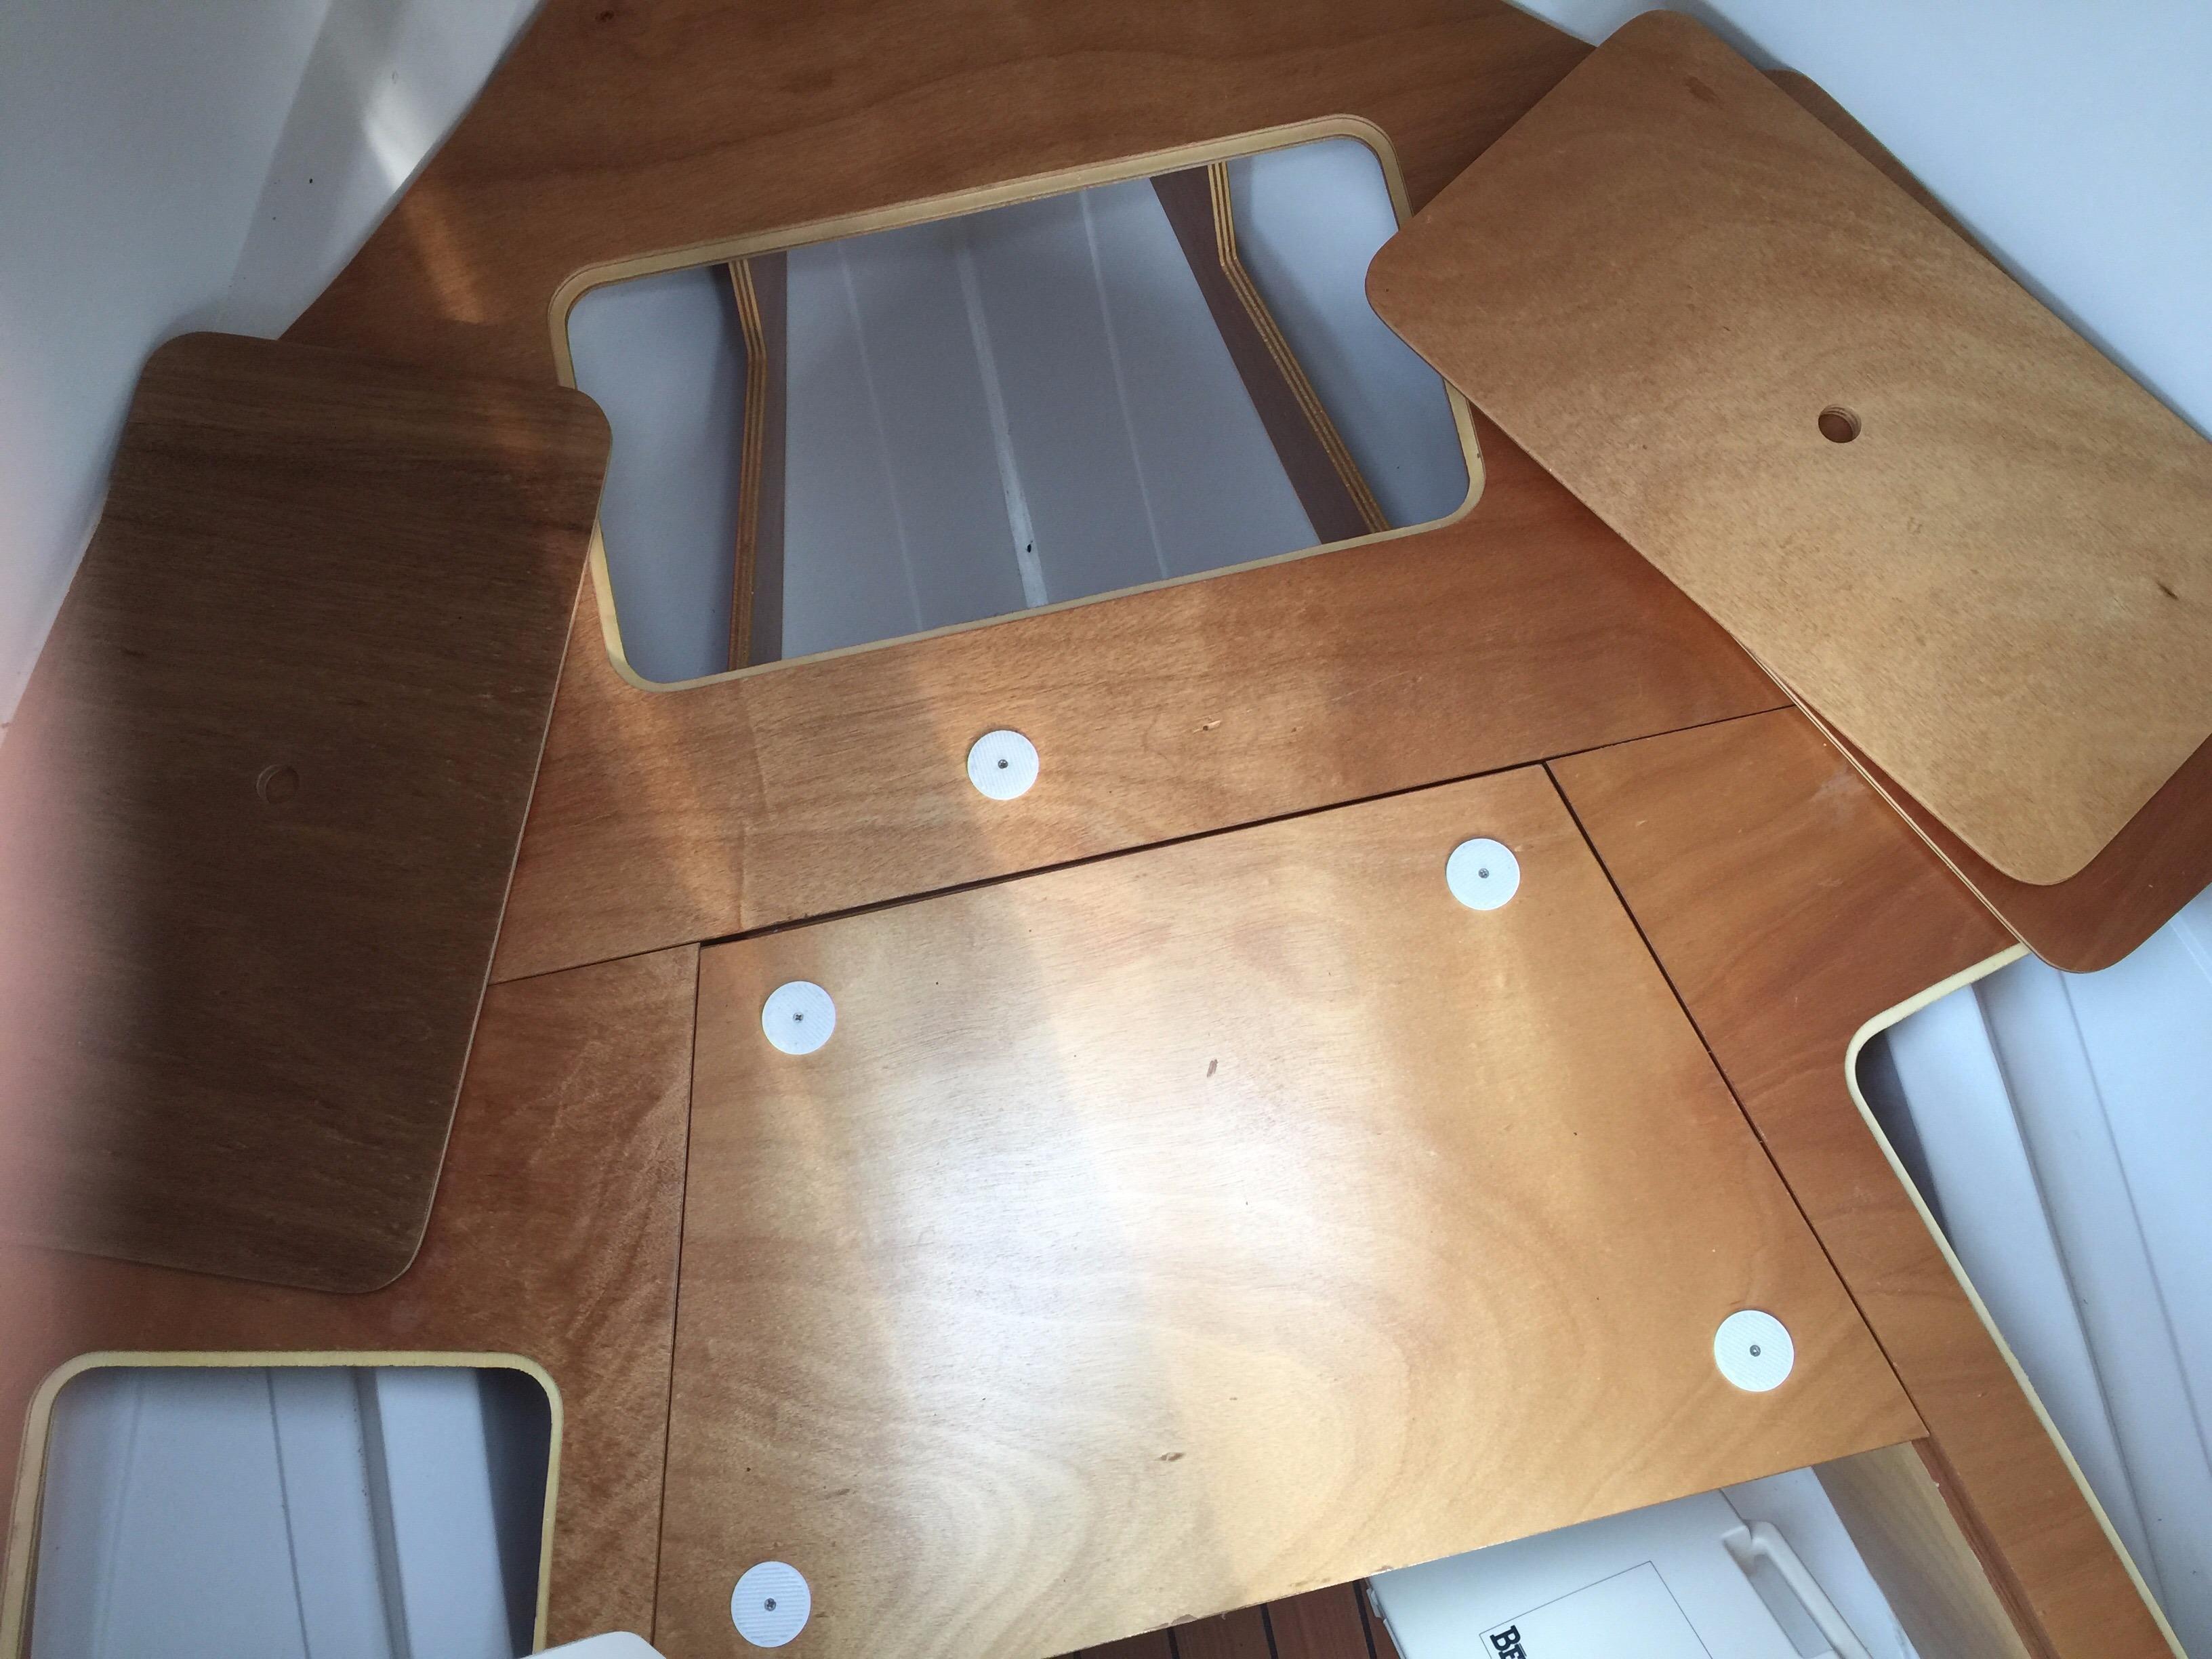 Beneteau Antares 580 For Sale Maiden Marine : 5981855201610250529498101XLARGE from www.maiden-marine.co.uk size 3264 x 2448 jpeg 672kB